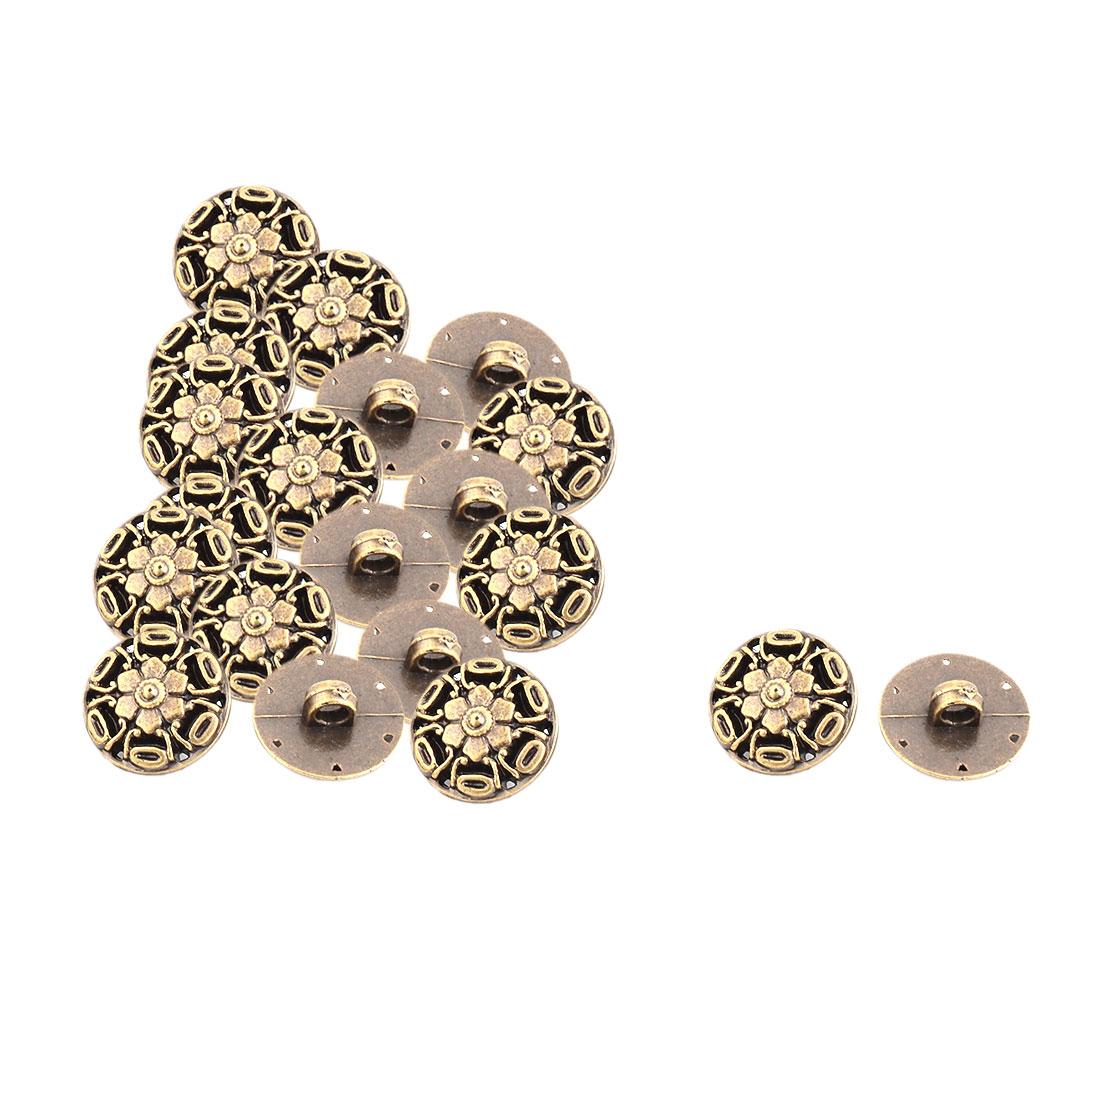 Home Plastic Flower Pattern Round Handmade DIY Decor Clothes Buttons 20 Pcs